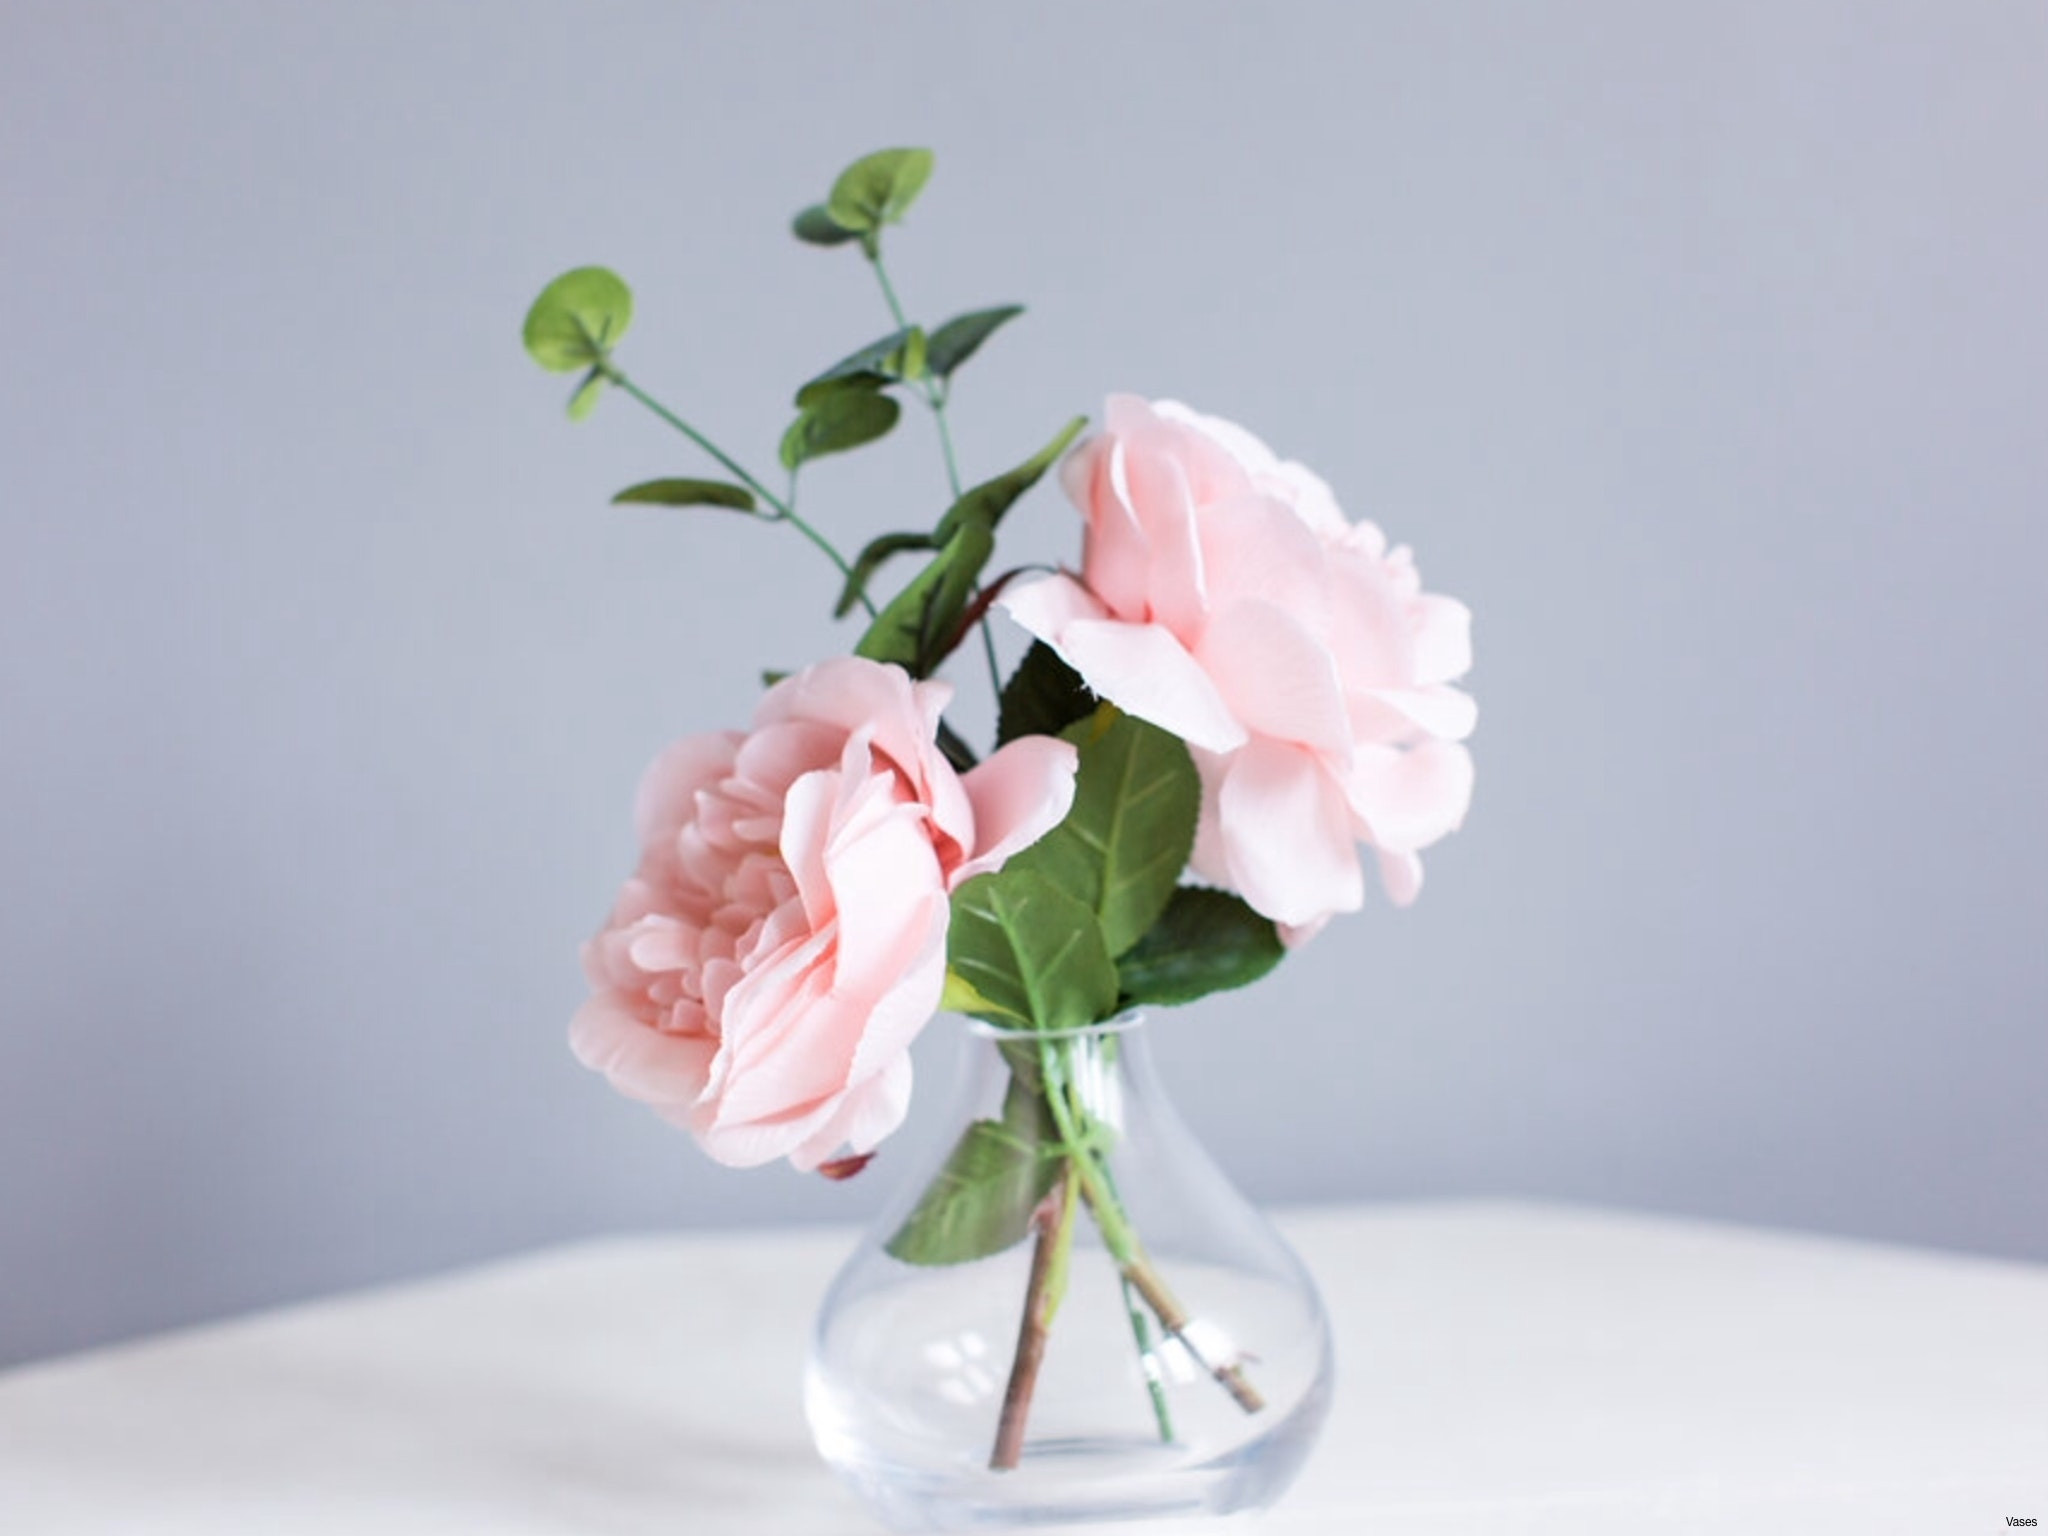 kaiser porcelain vase value of rose bud vases photos luxury lsa flower colour bud vase red h vases with gallery of rose bud vases